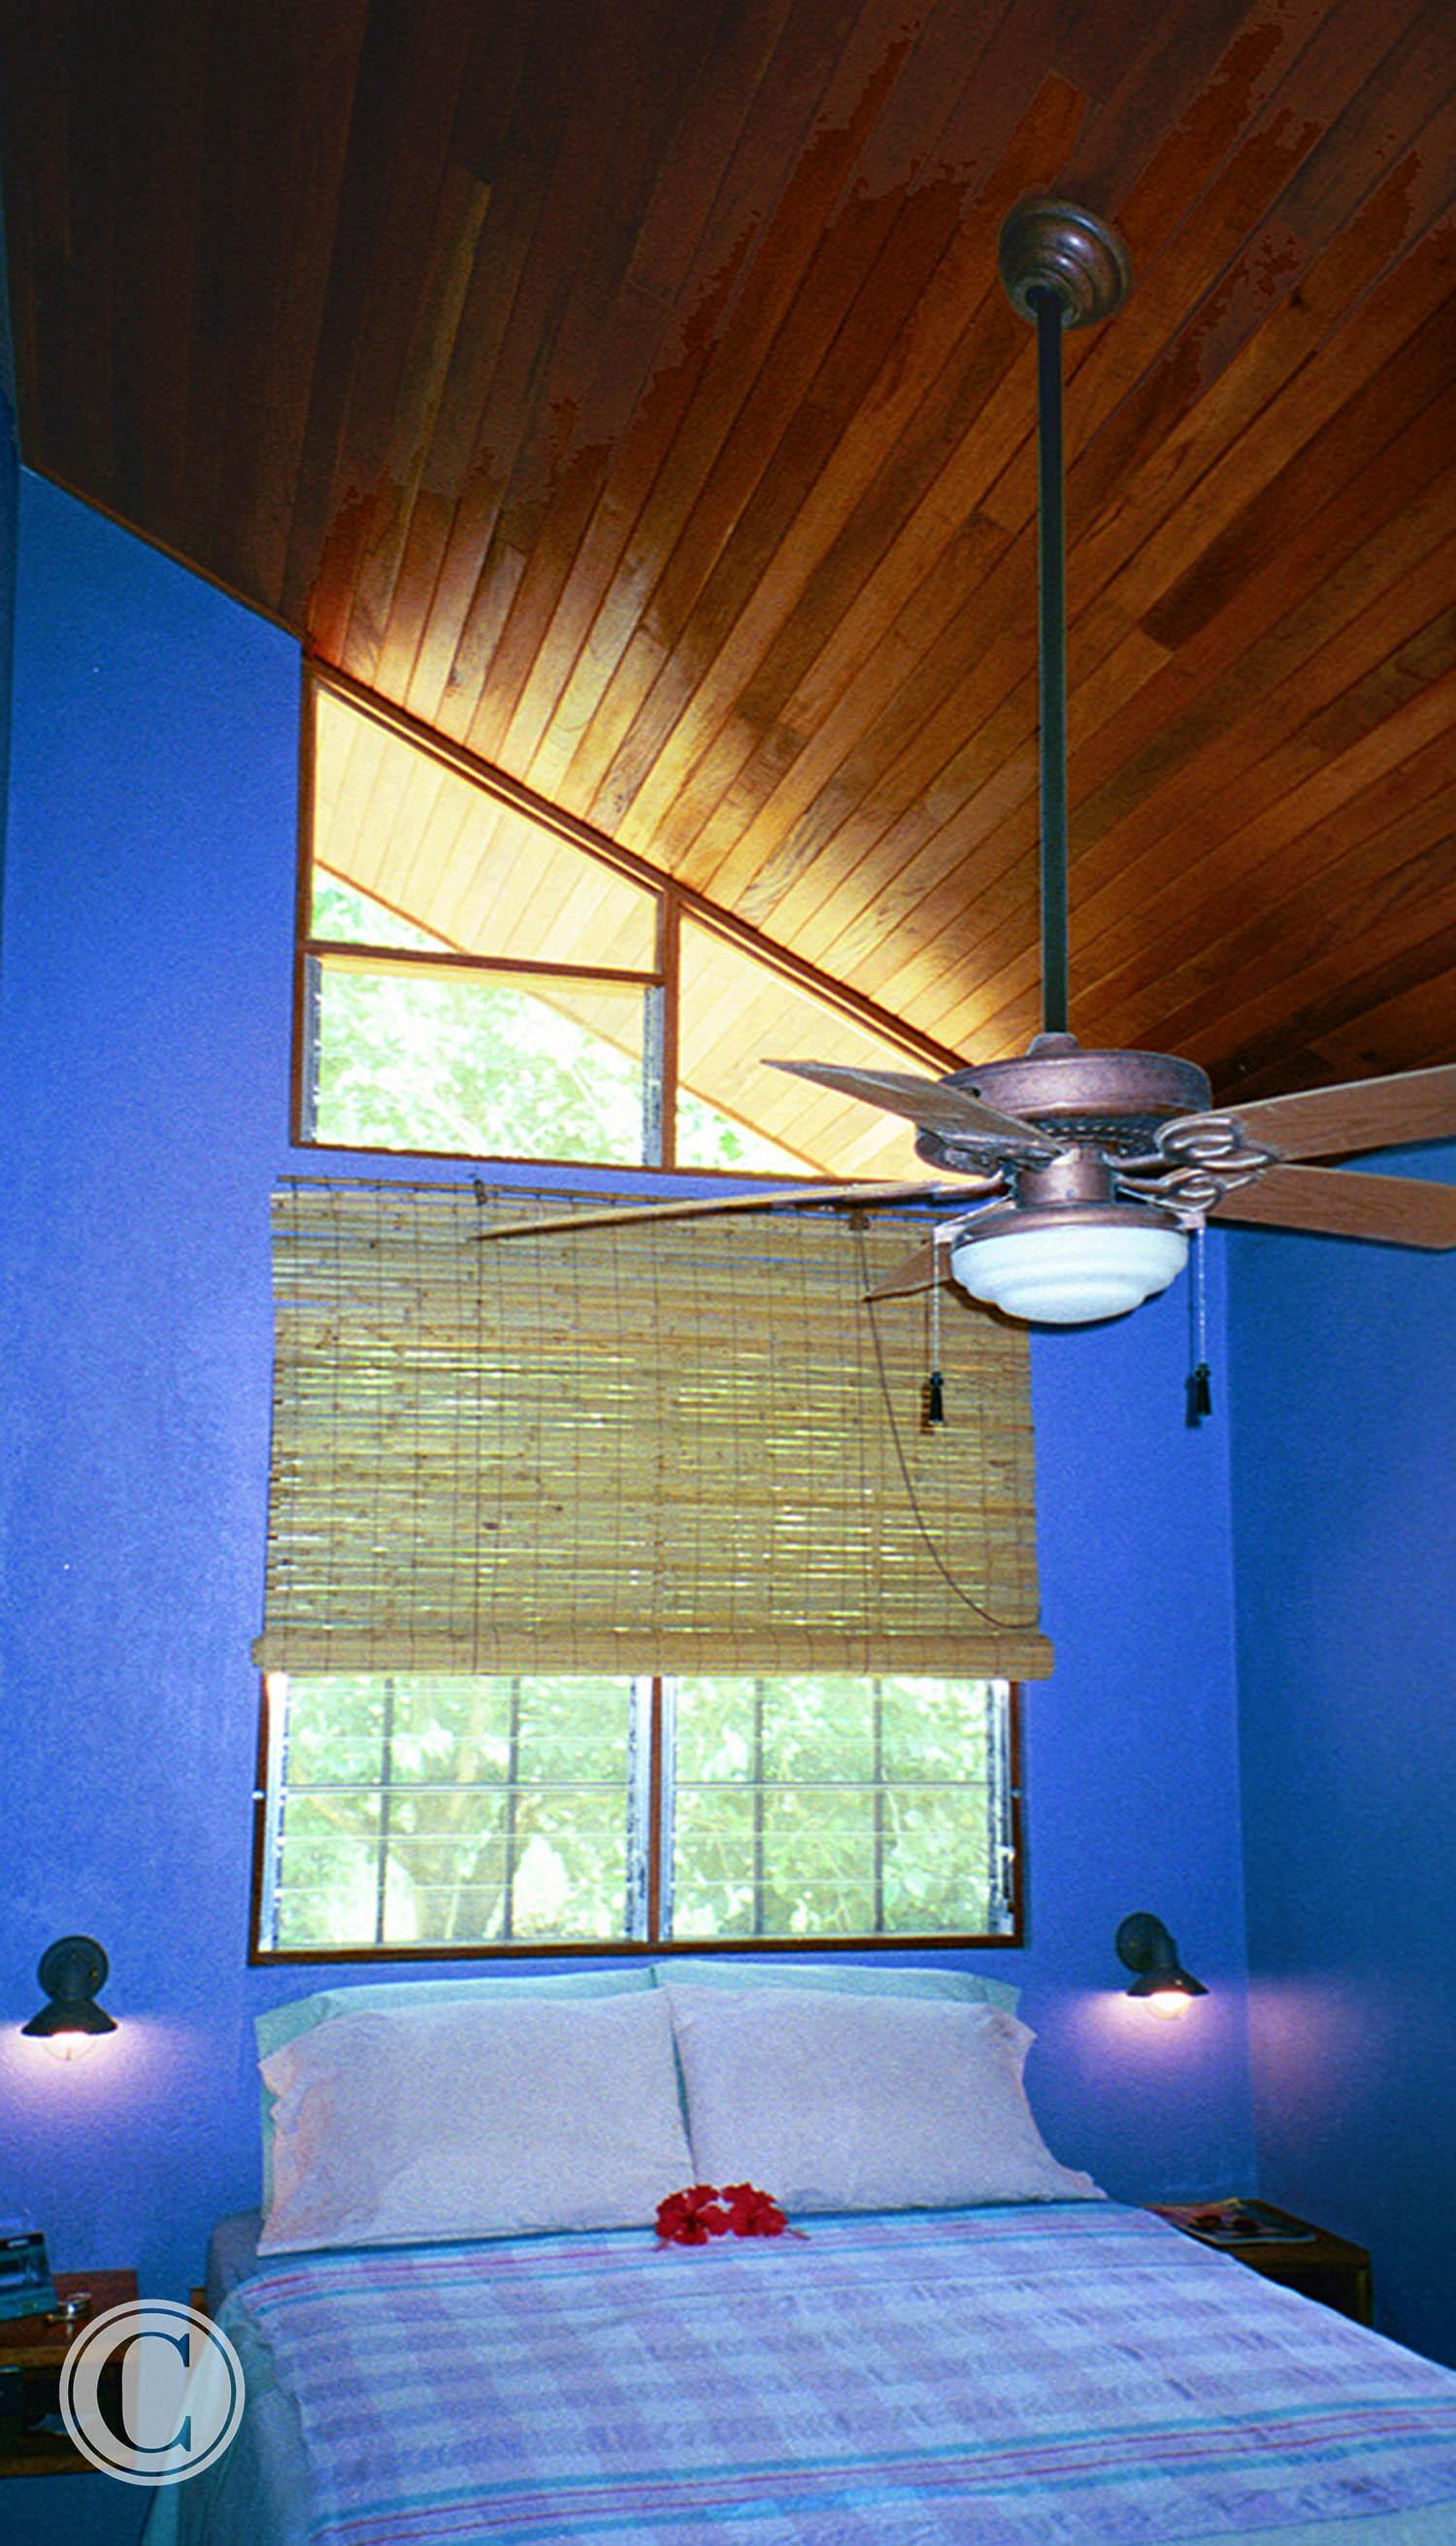 bedrooms-costa-rica-cornelius-construction (5).jpg